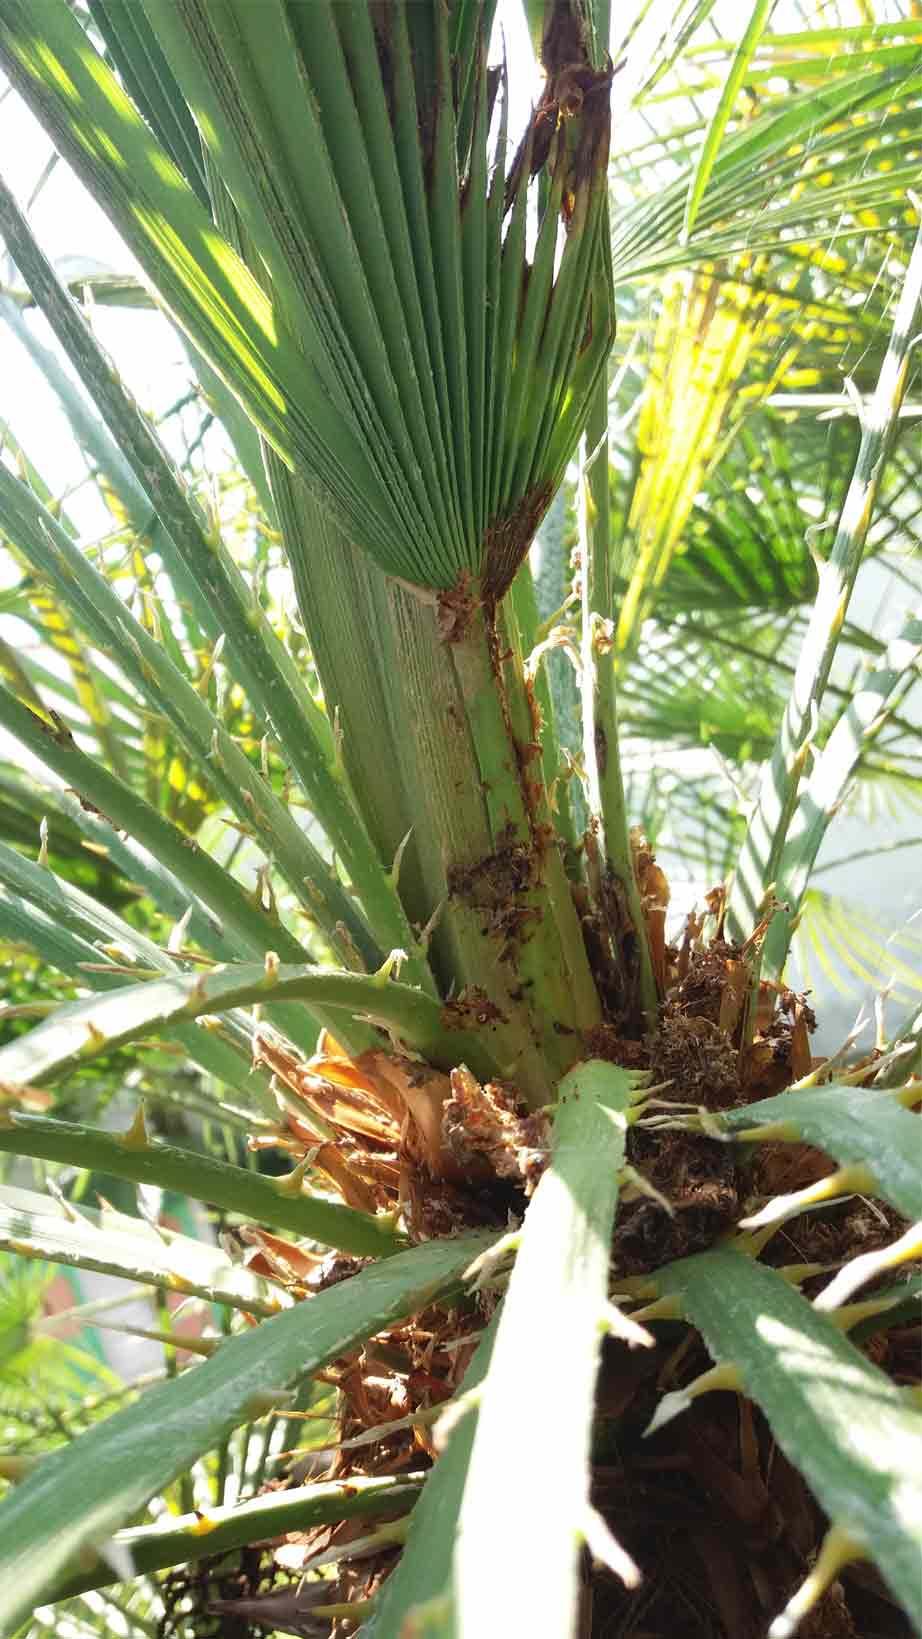 Symptoms-trachicarpus-palms-bud-attack-4